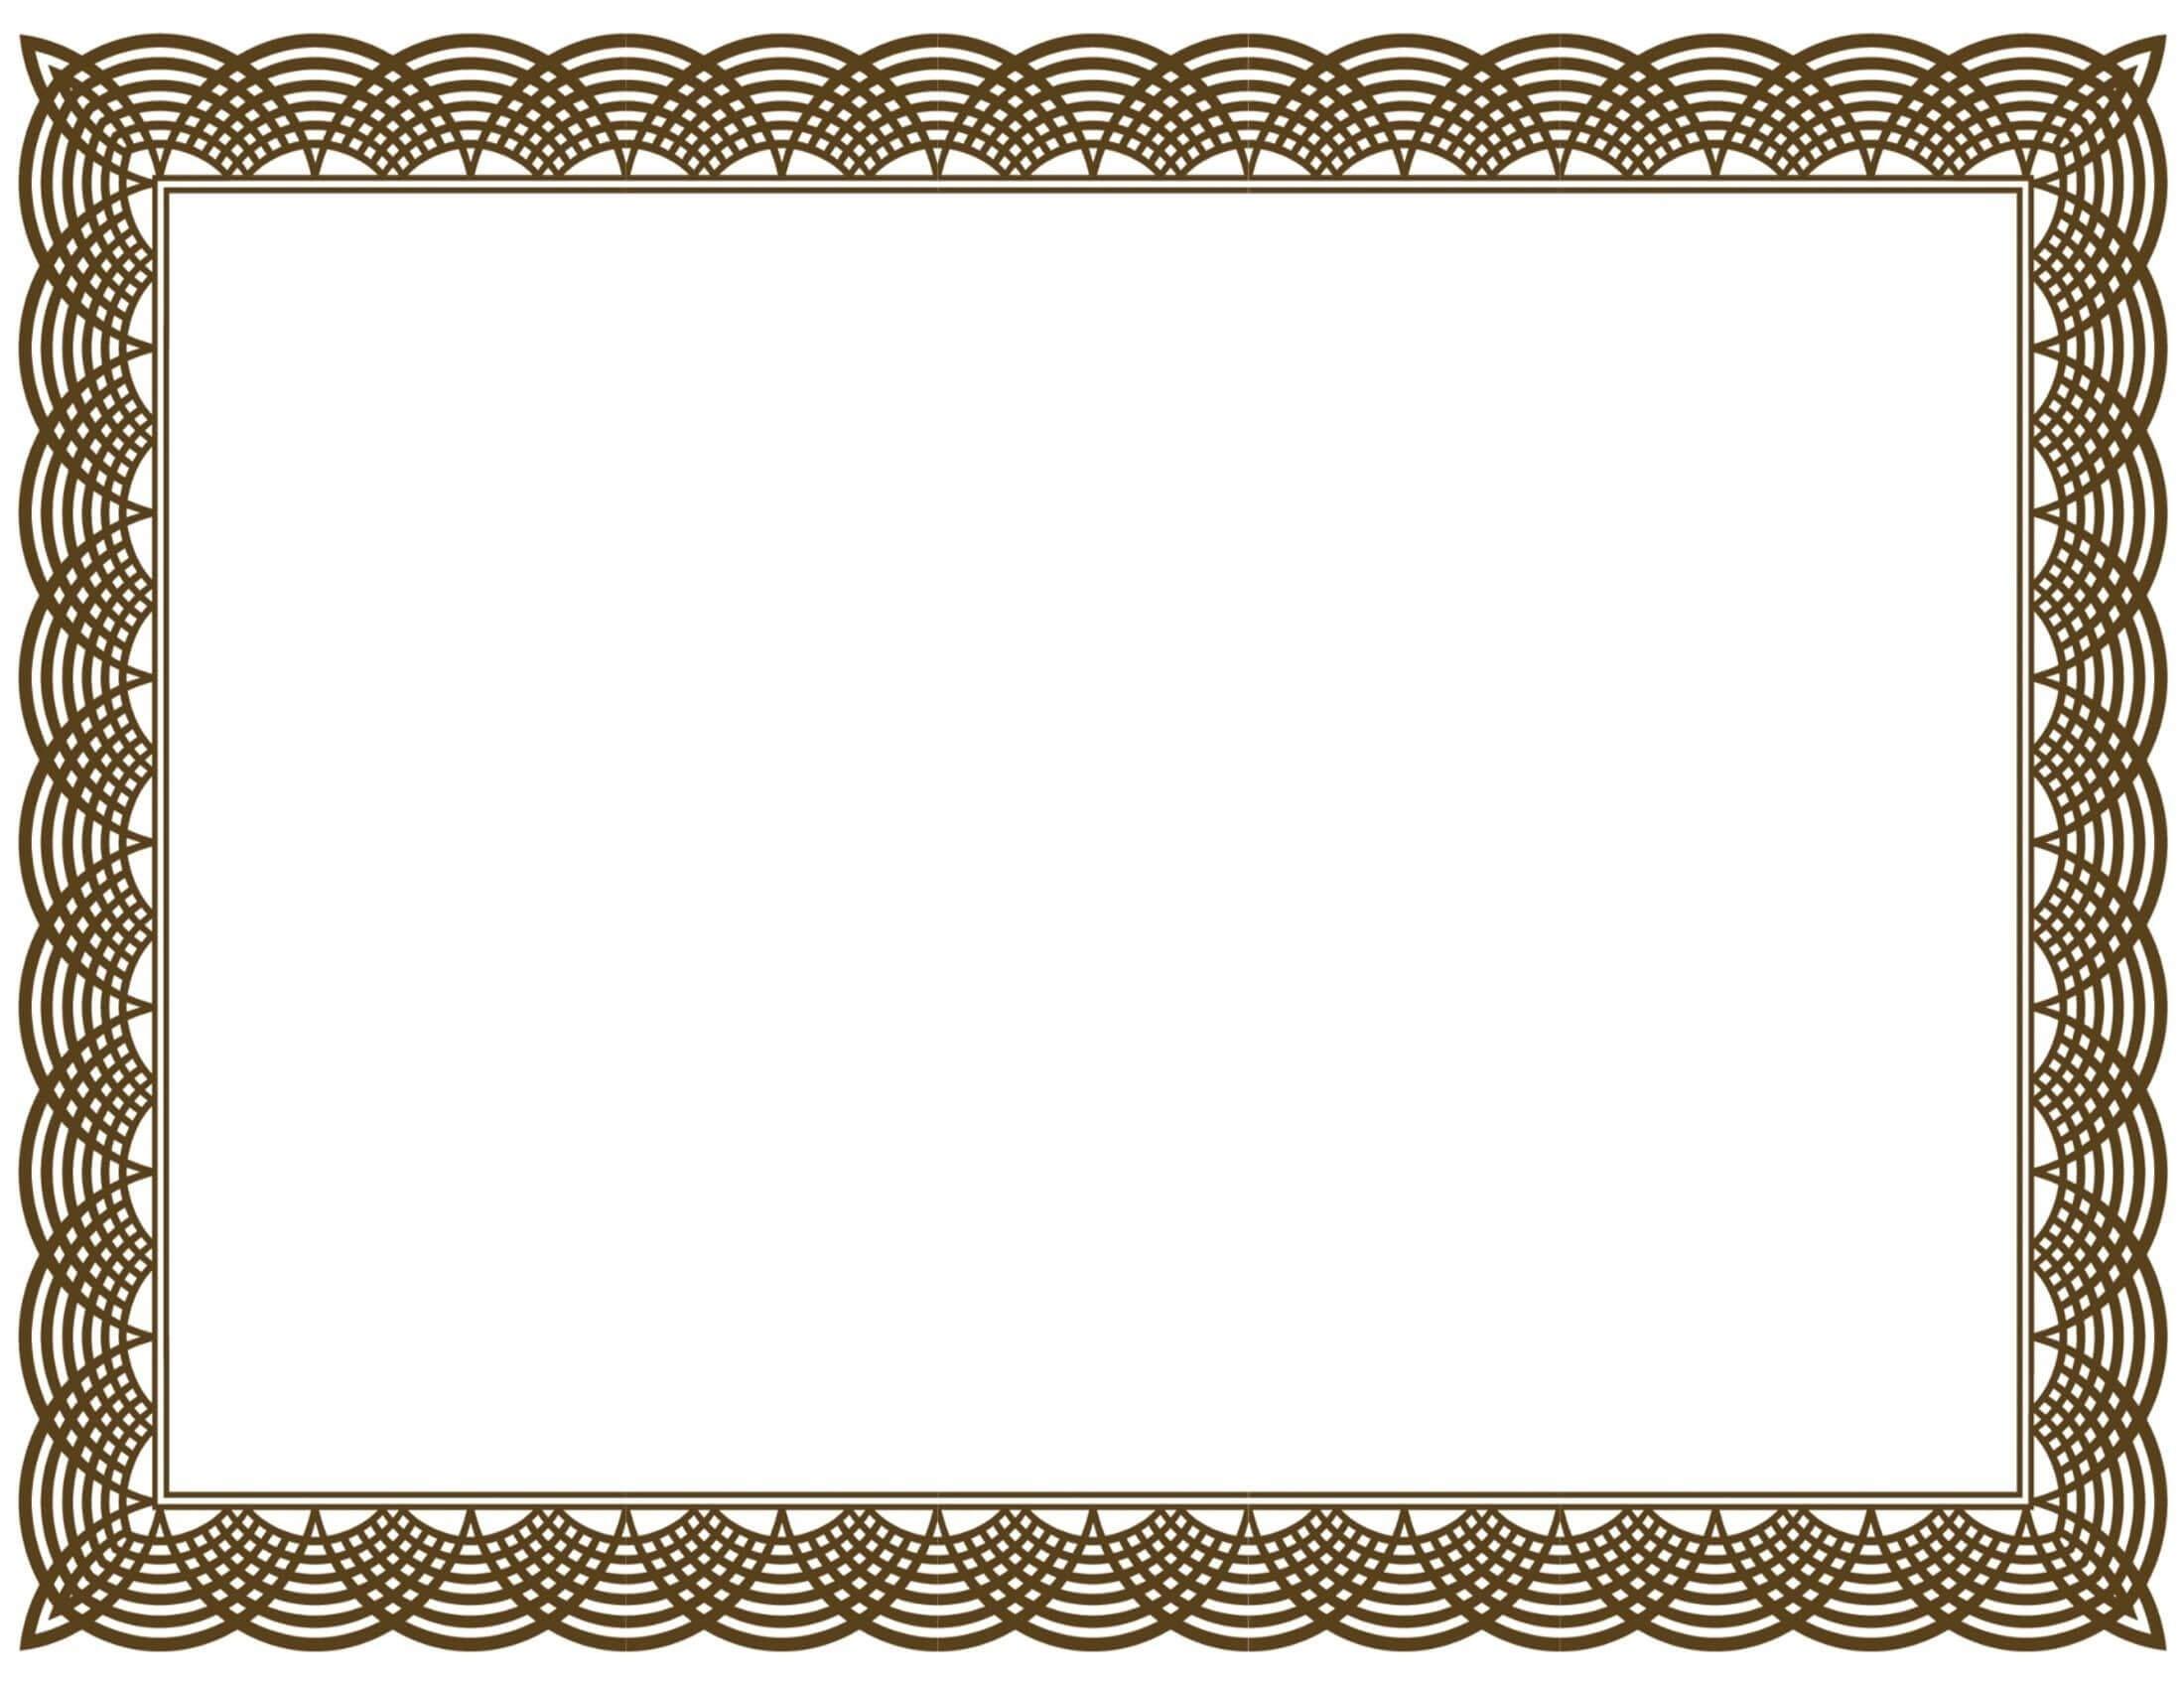 Award Certificate Border Pdf Template In Certificate Border In Award Certificate Border Template